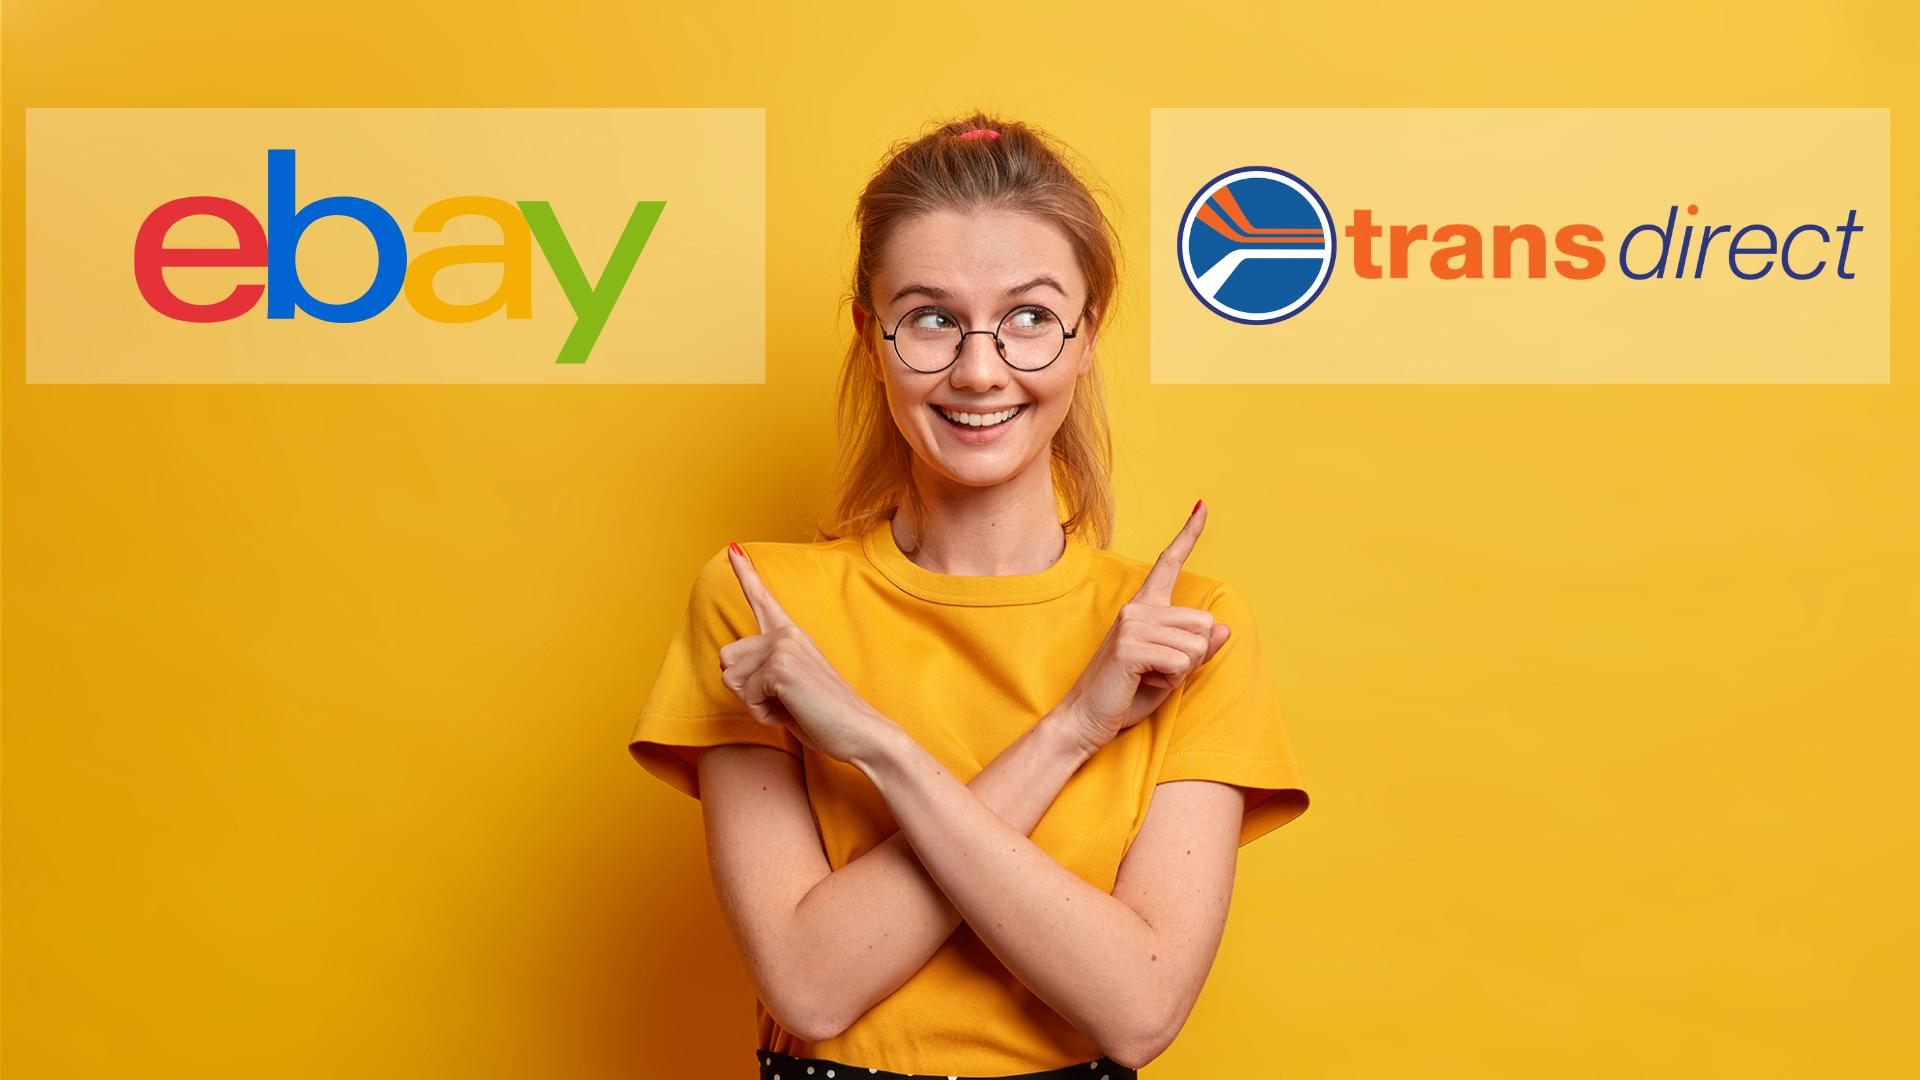 Ebay and Transdirect